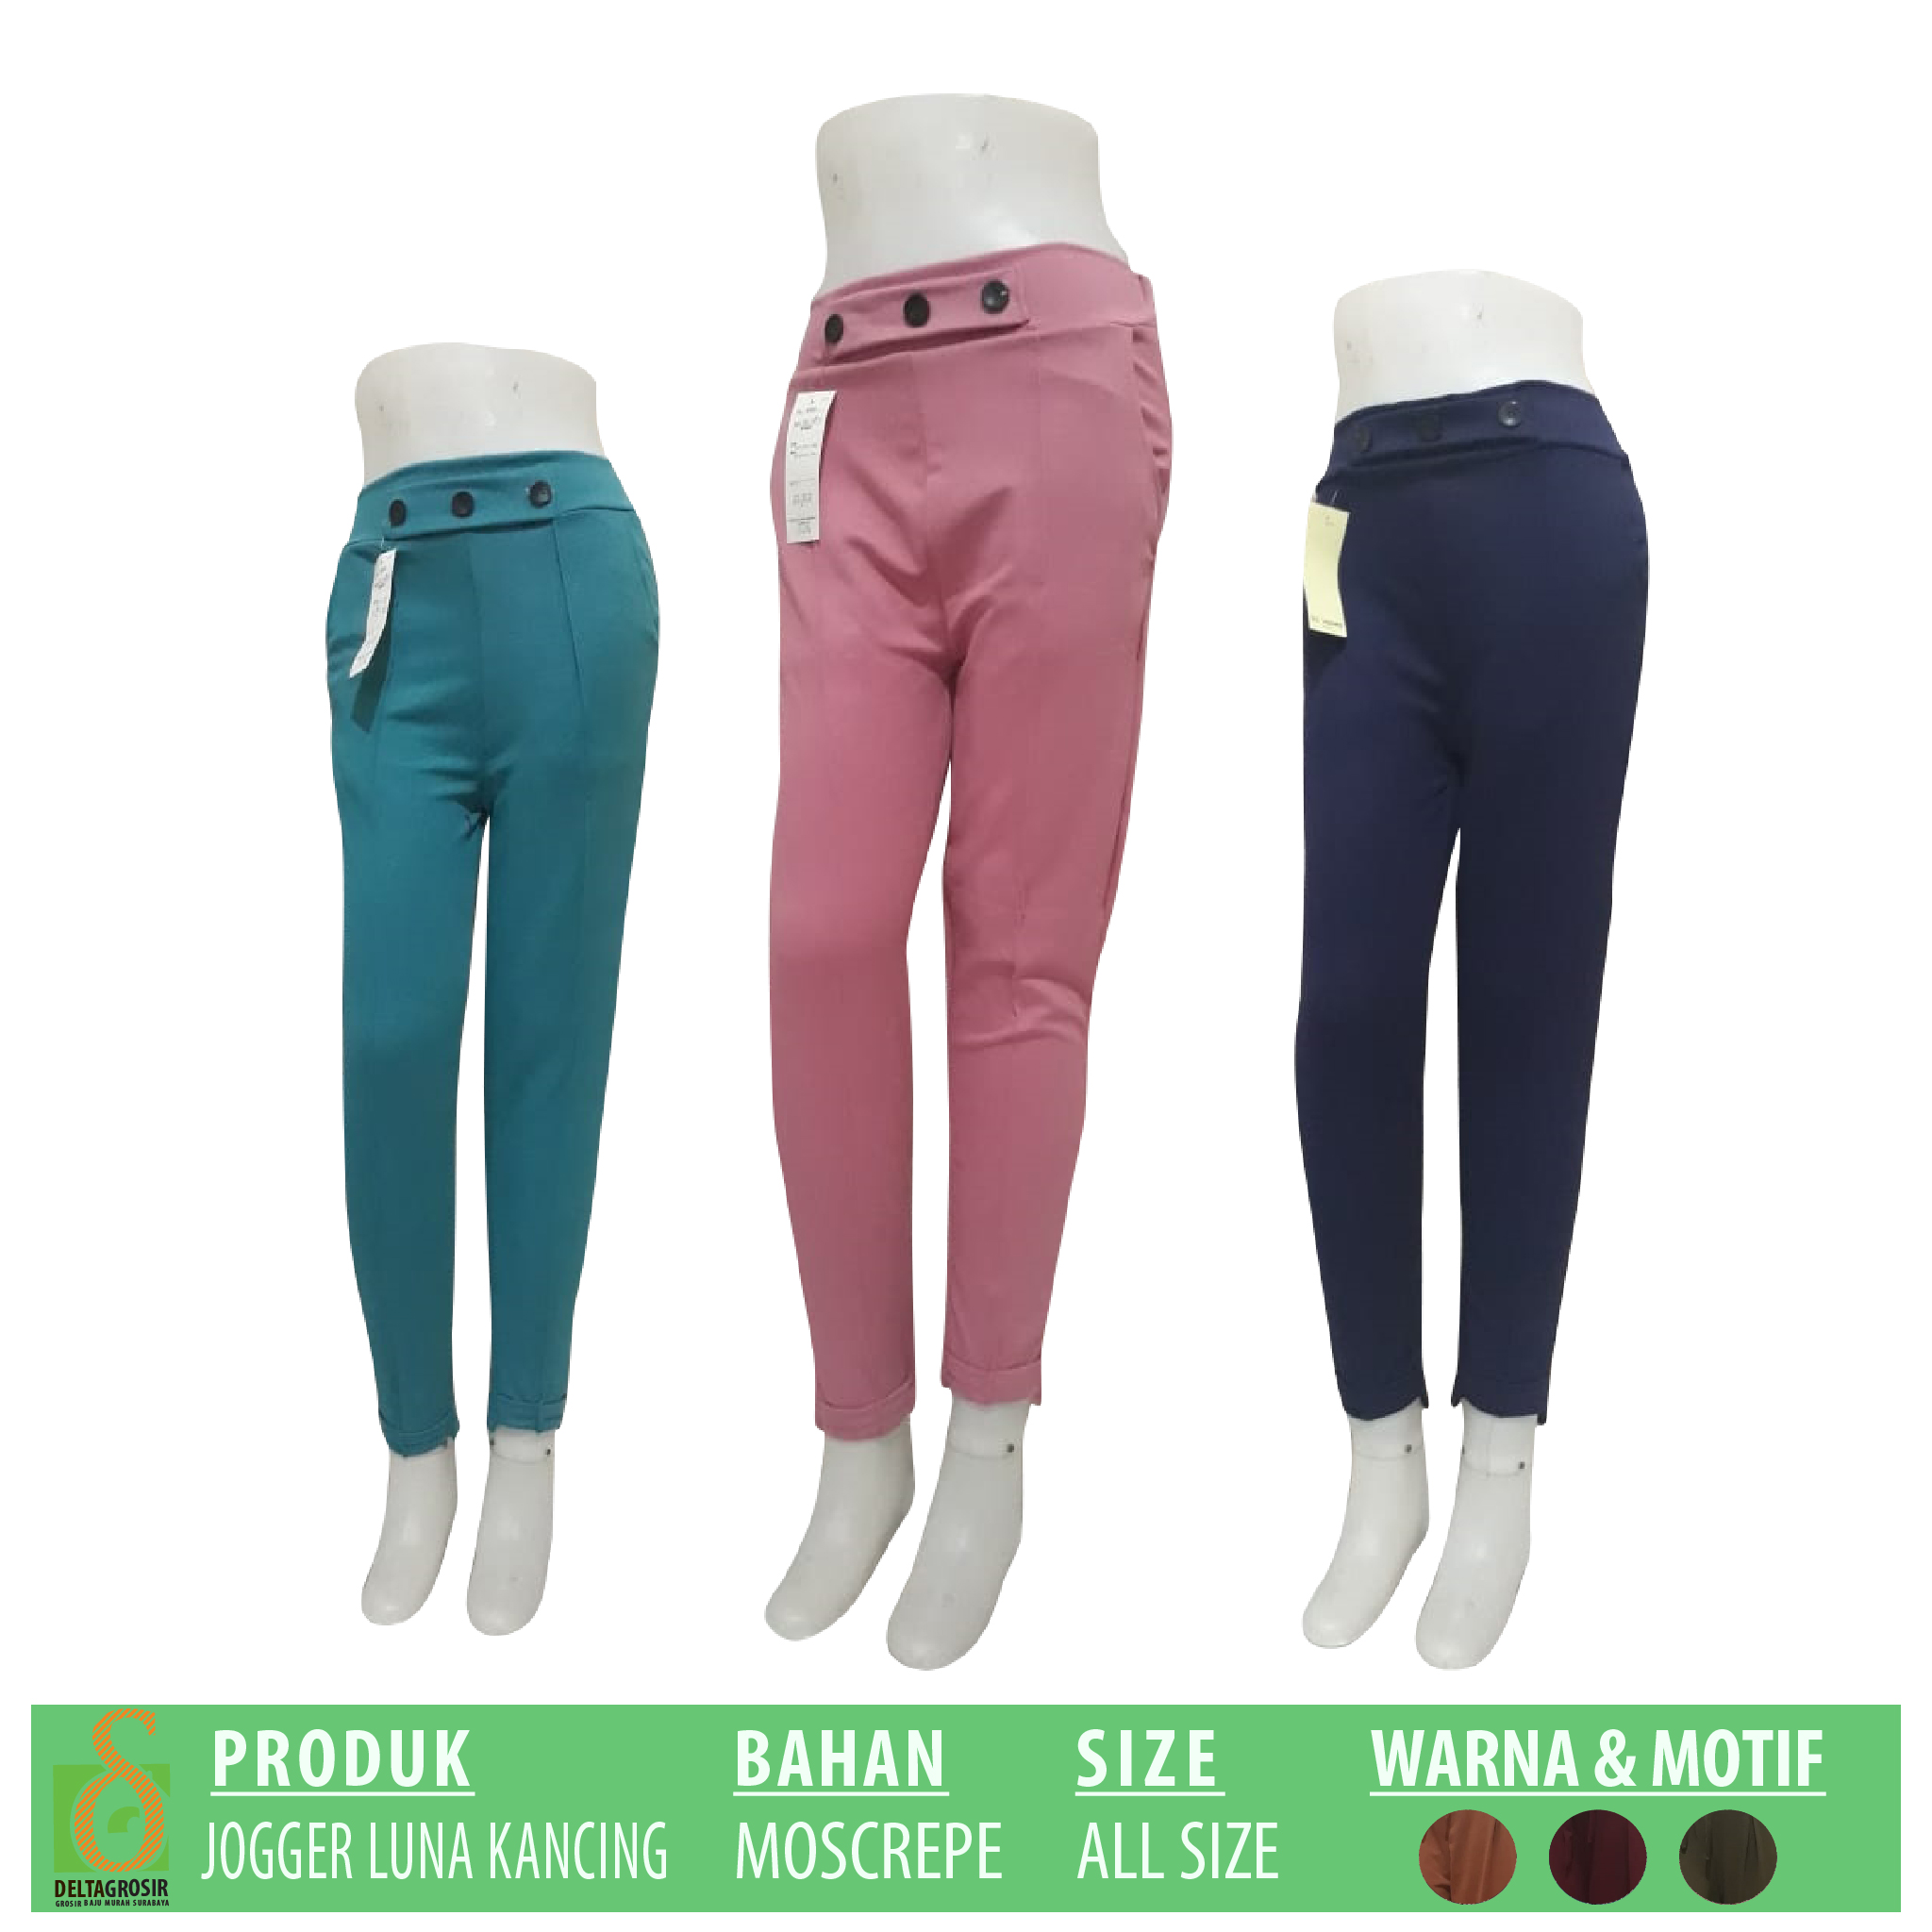 Pabrik Celana Jogger Luna Kancing Dewasa Murah di Surabaya